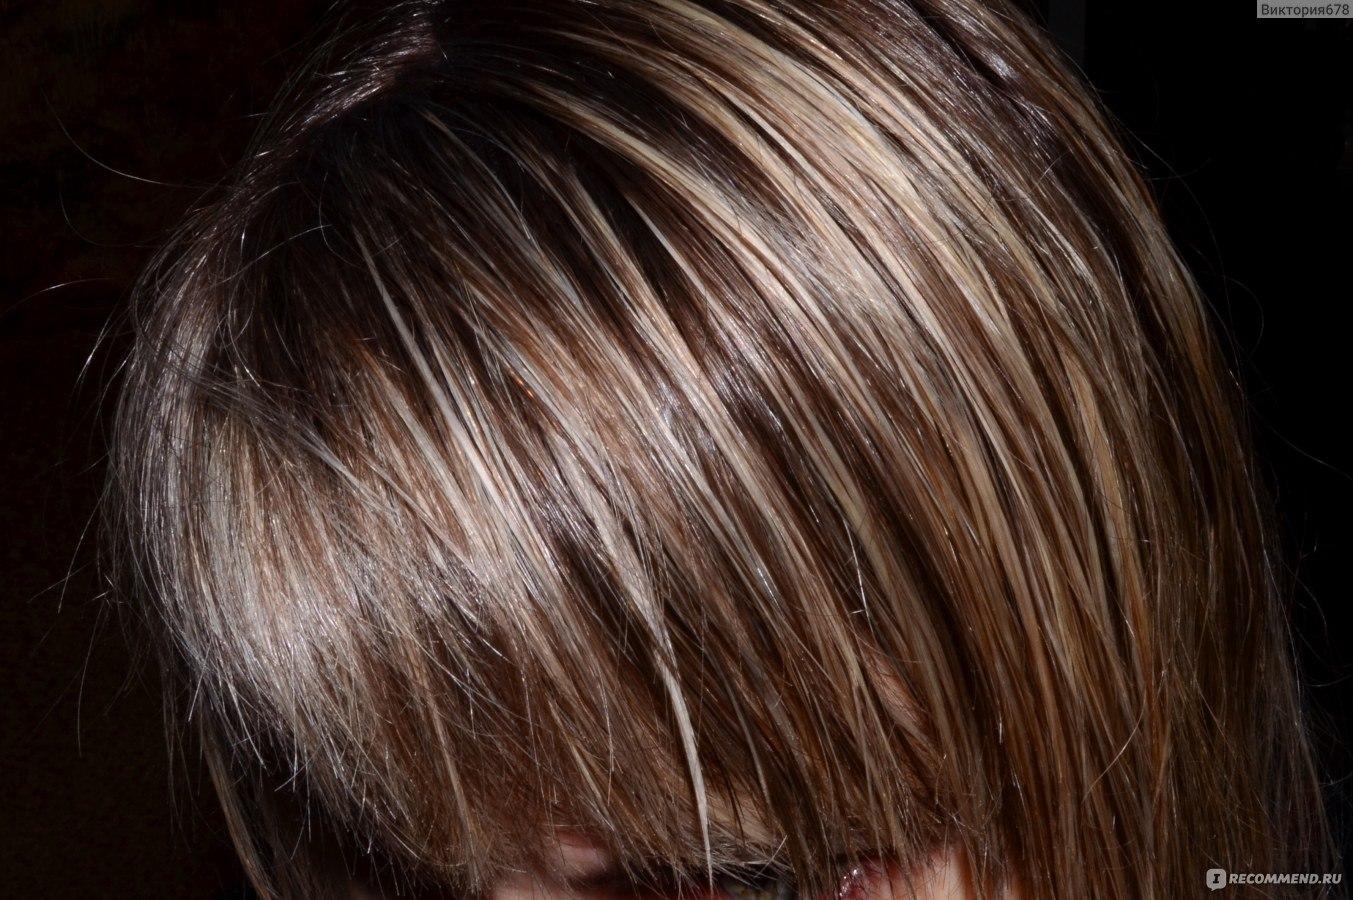 Средства для укладки матрикс для тонких волос